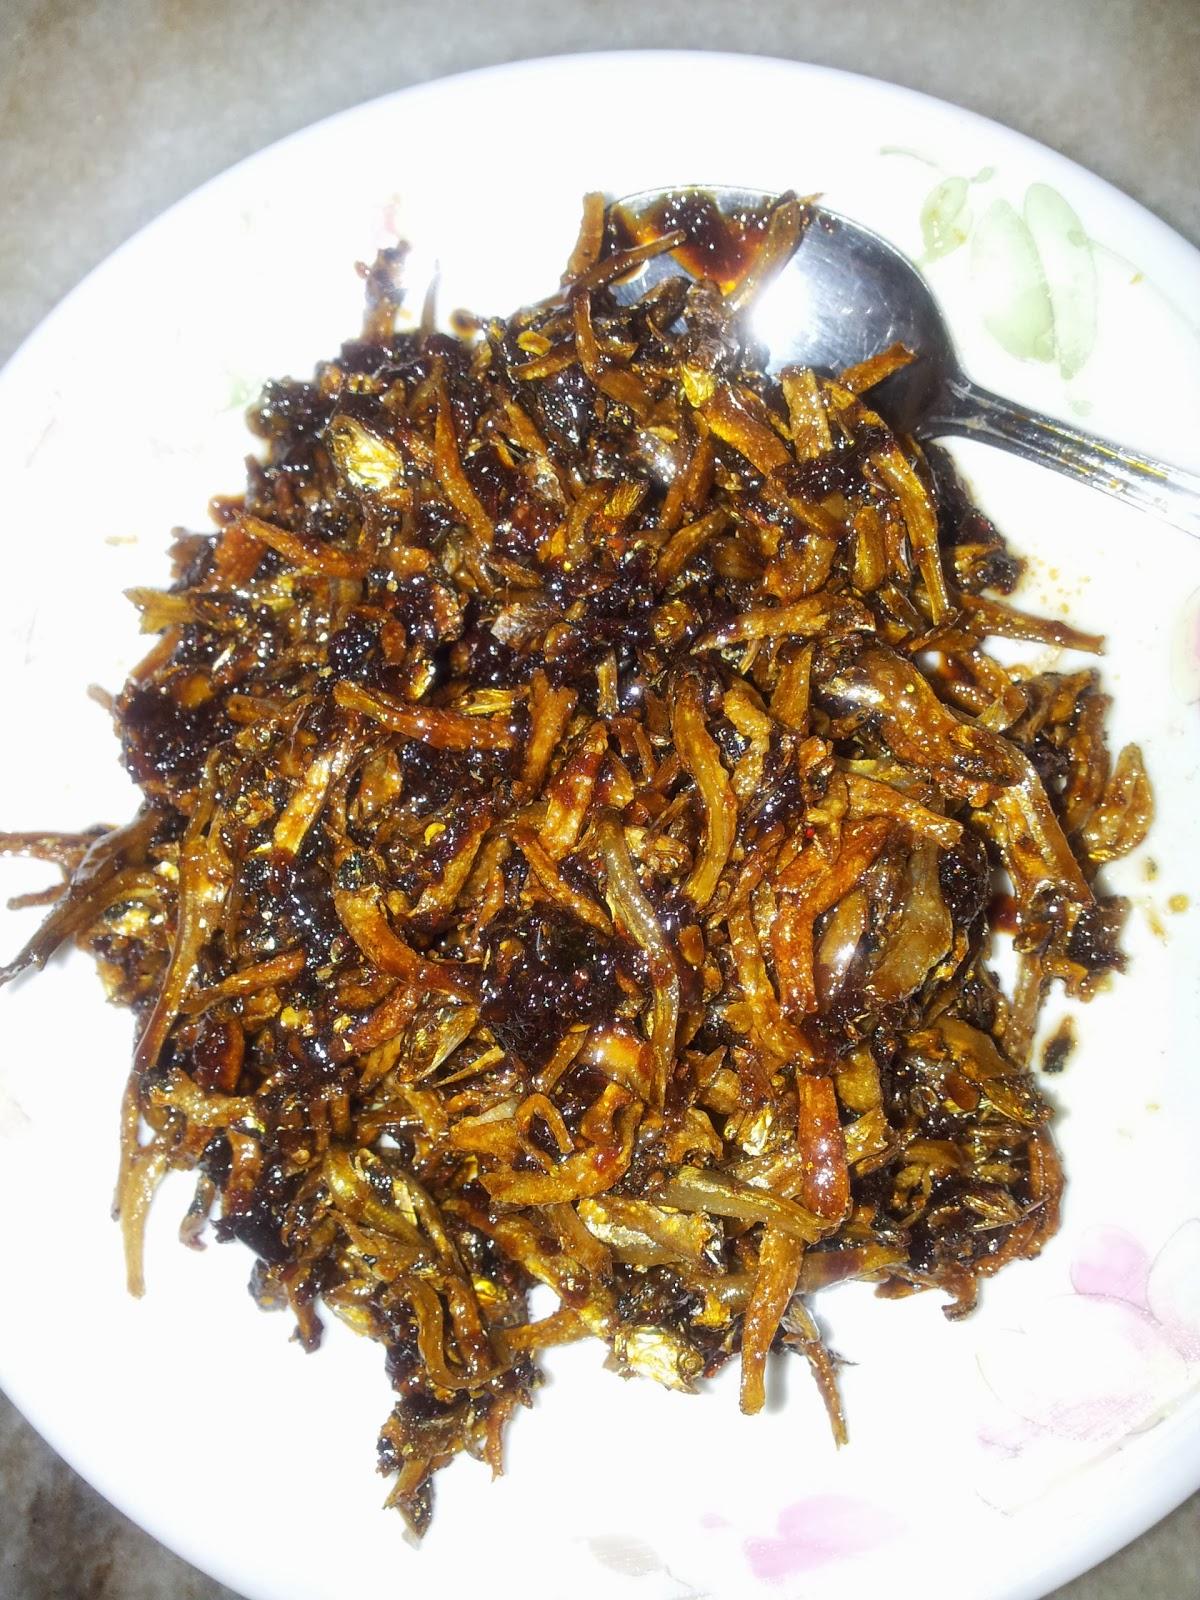 resepi ayam masak kicap  senang surasmi Resepi Mee Palembang Enak dan Mudah